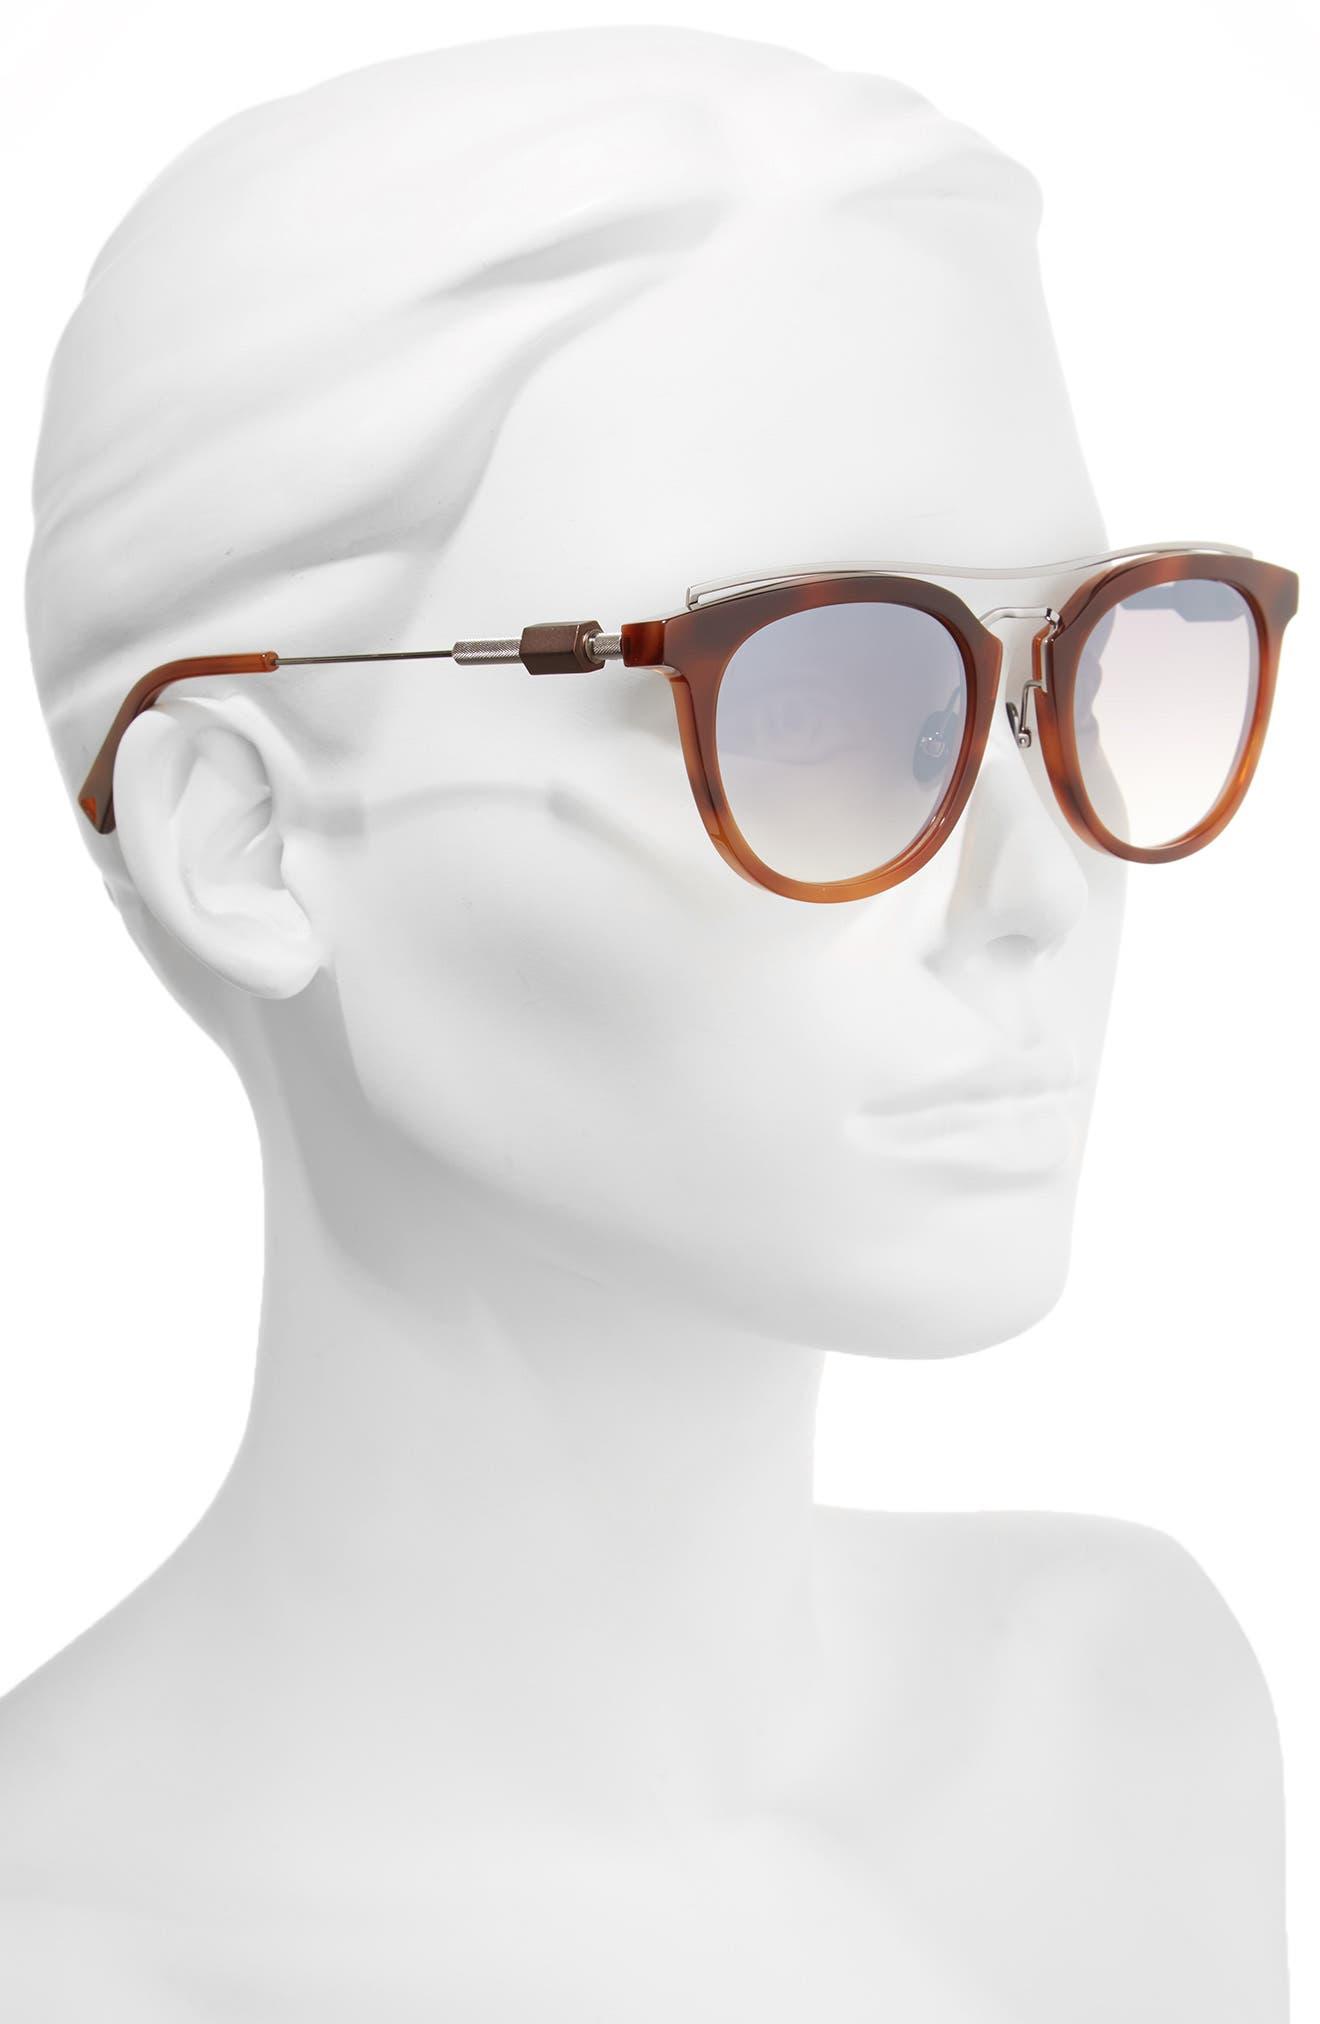 Zeal 52mm Aviator Sunglasses,                             Alternate thumbnail 2, color,                             Amber